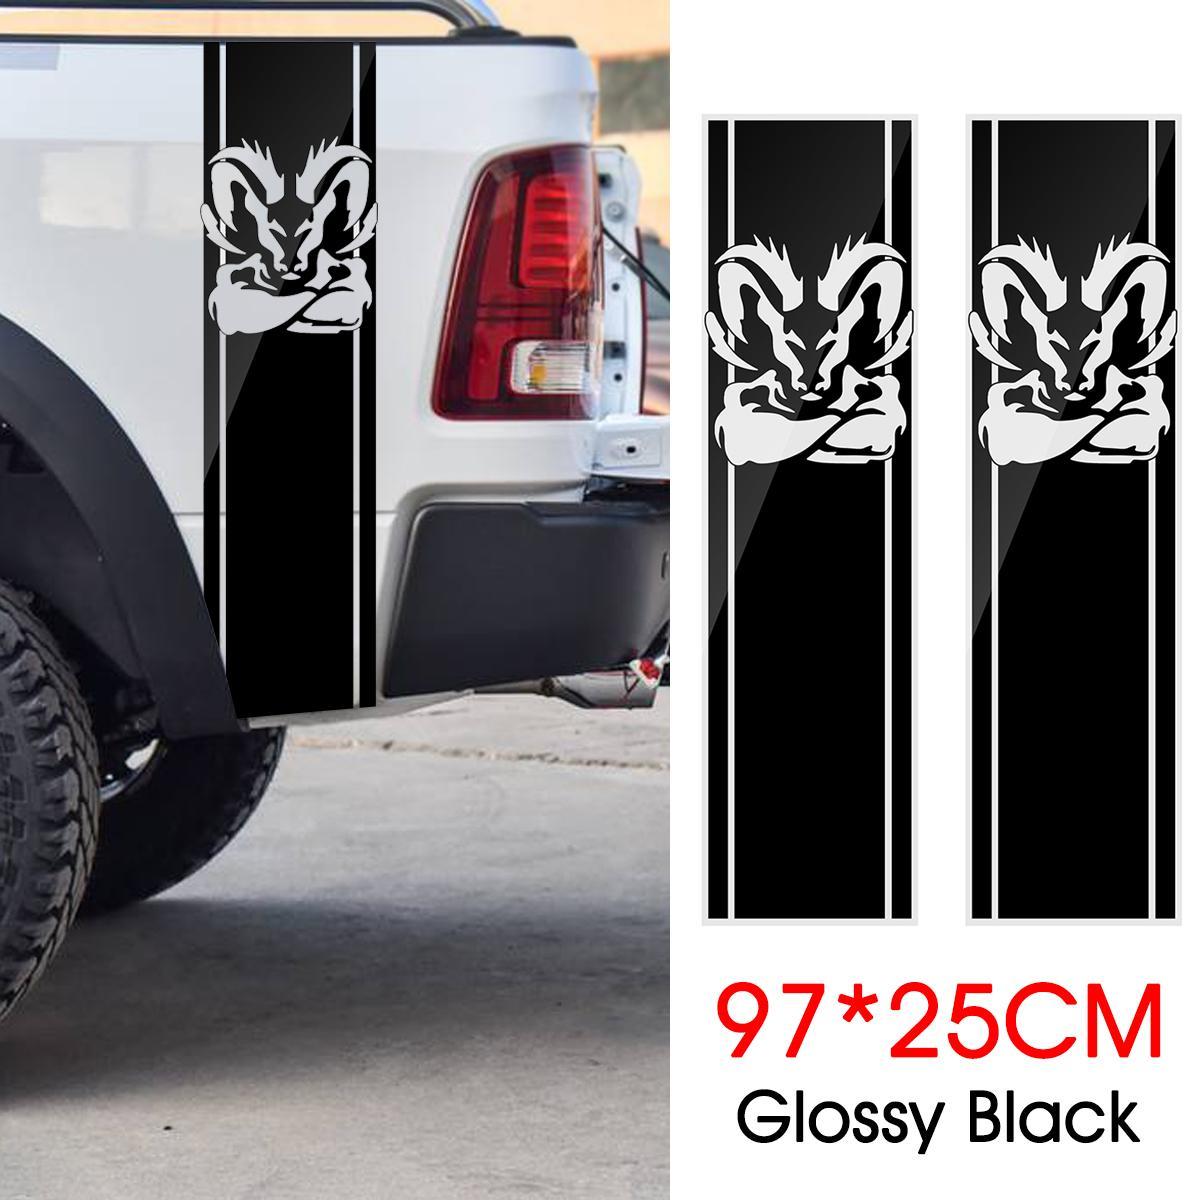 Dodge Ram 1500 2500 3500 Vinyl Decal Racing Sticker Stripe Hemi Mopar 5.7L DS011